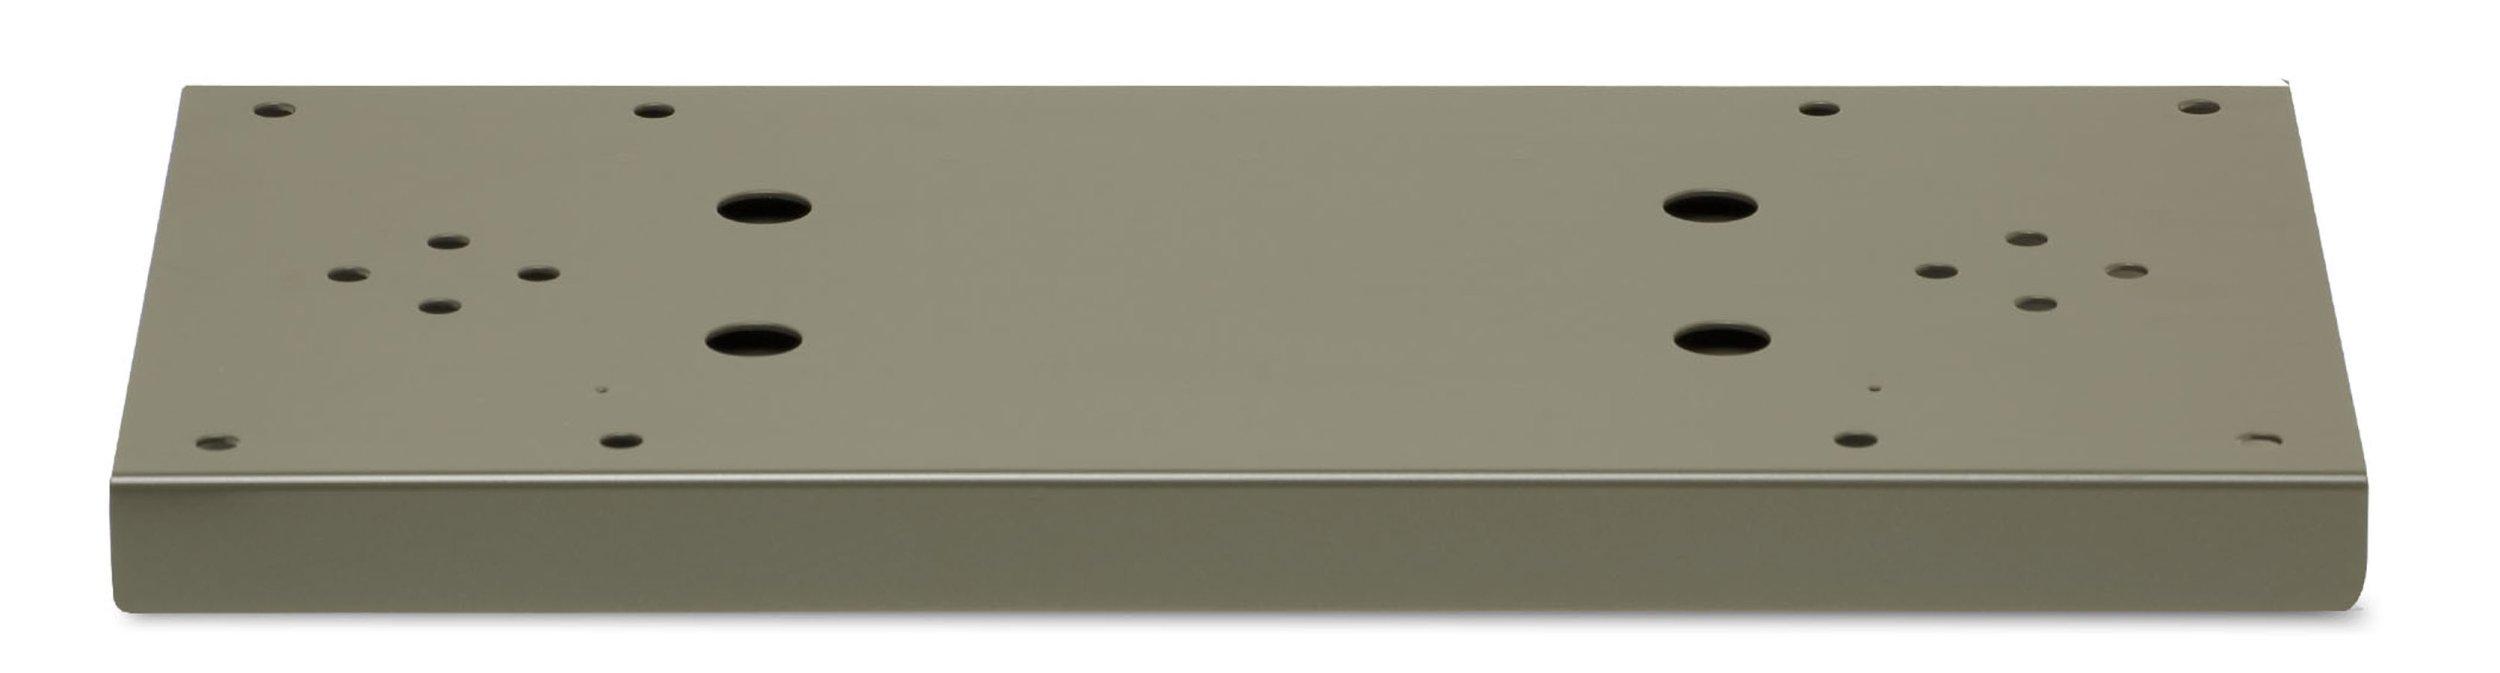 Architectural Mailboxes Duo Spreader Plate, Graphite Bronze